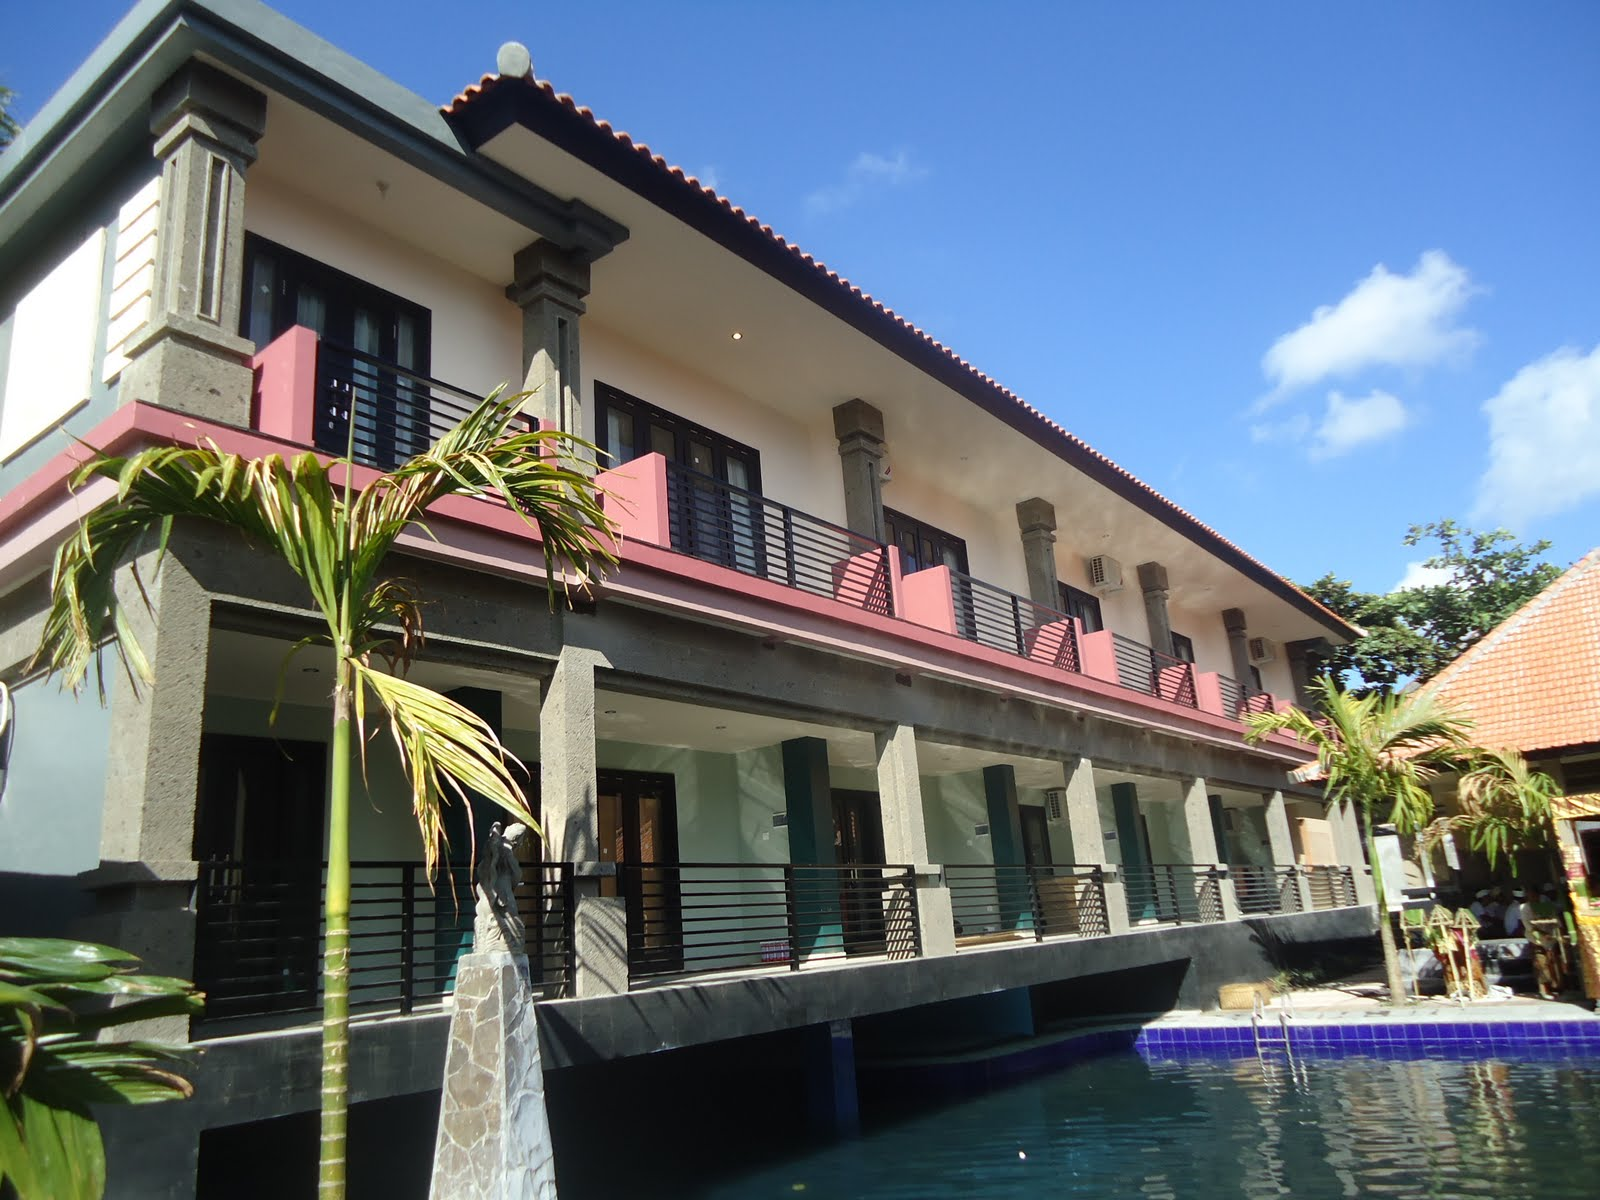 Hotel Puri Tanah Lot Hotel Puri Ayu Taman Tirta Ayu Pool Mansion